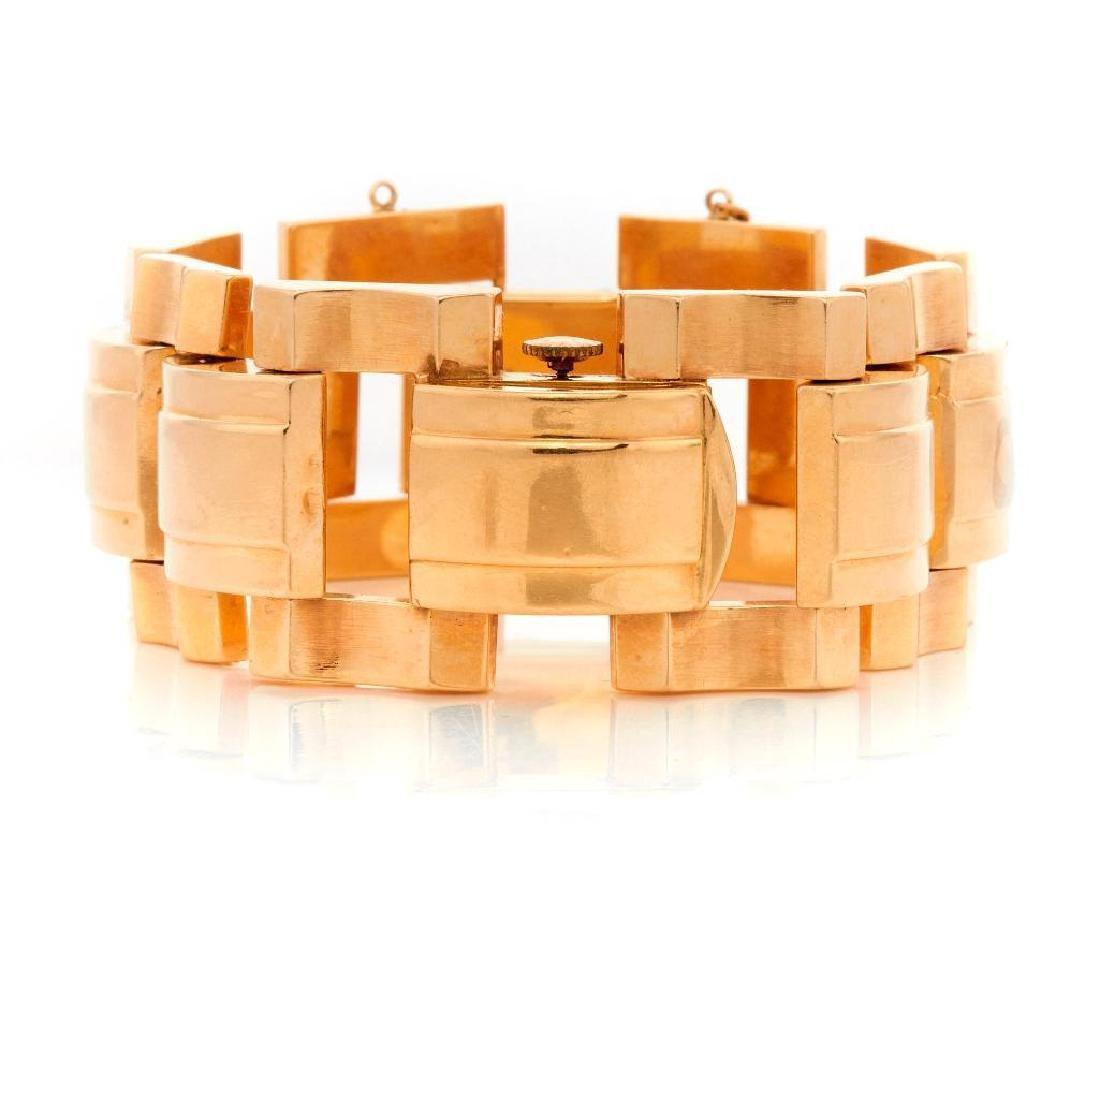 Retro 14k gold ladies covered wristwatch